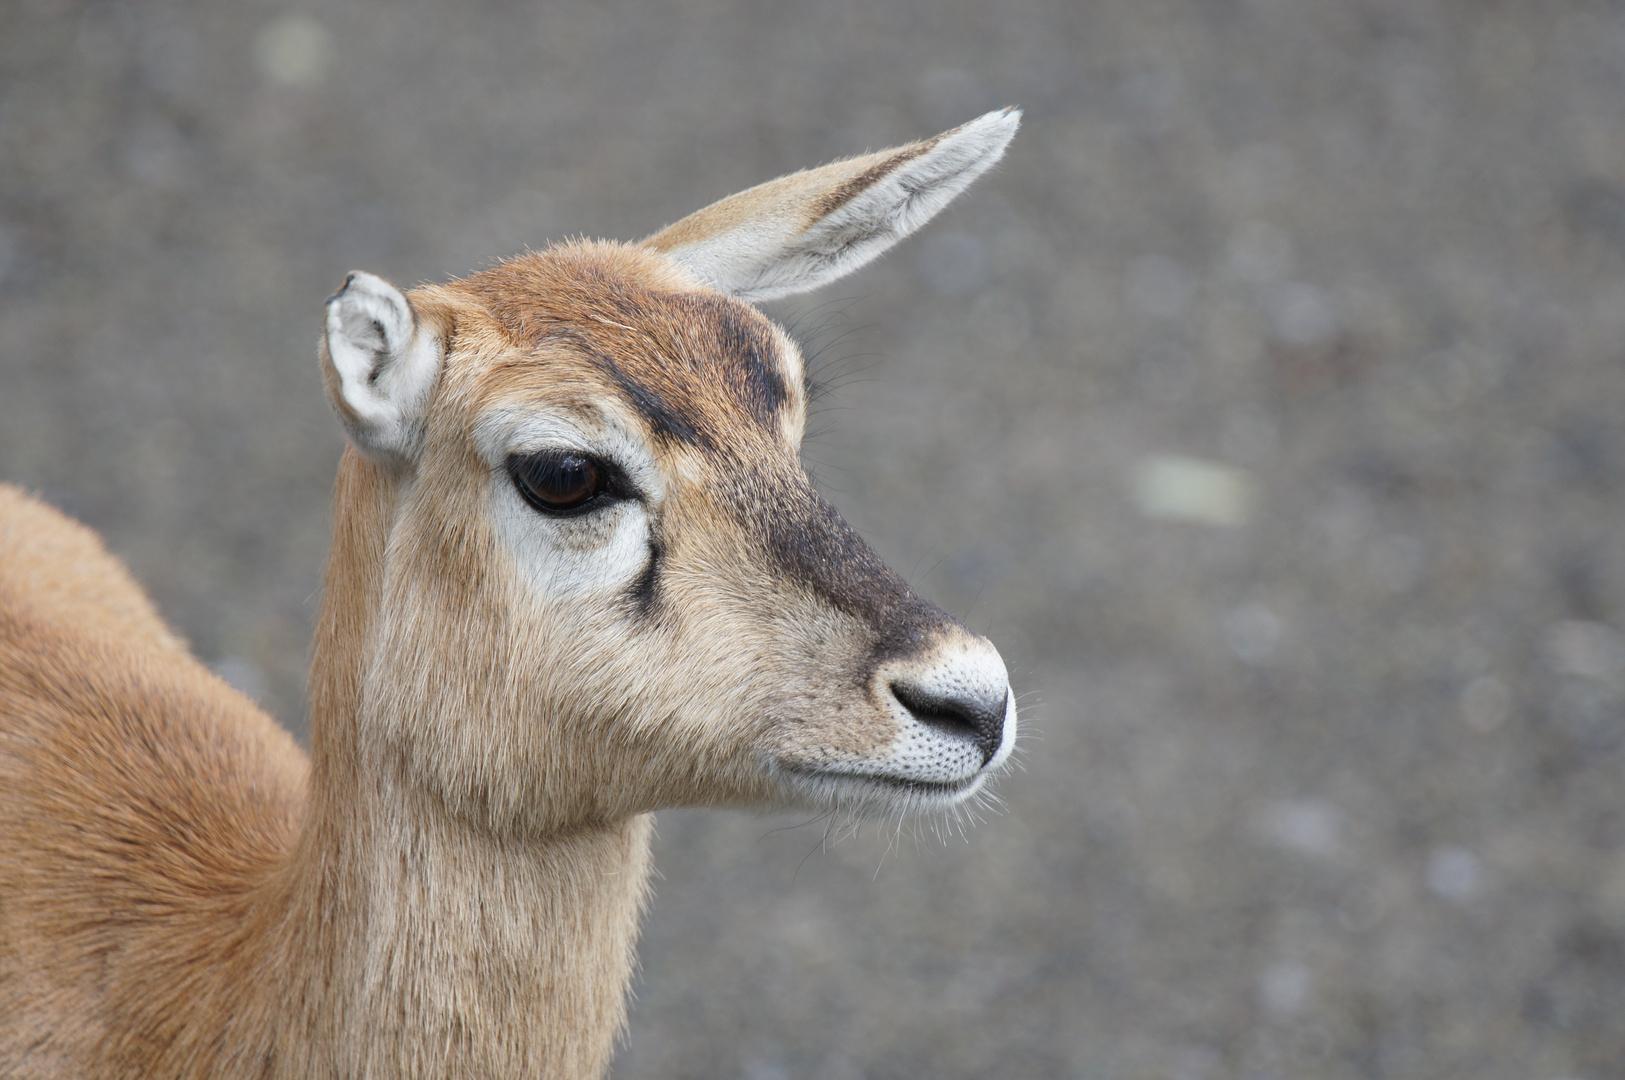 Antilope im Züri-Zoo